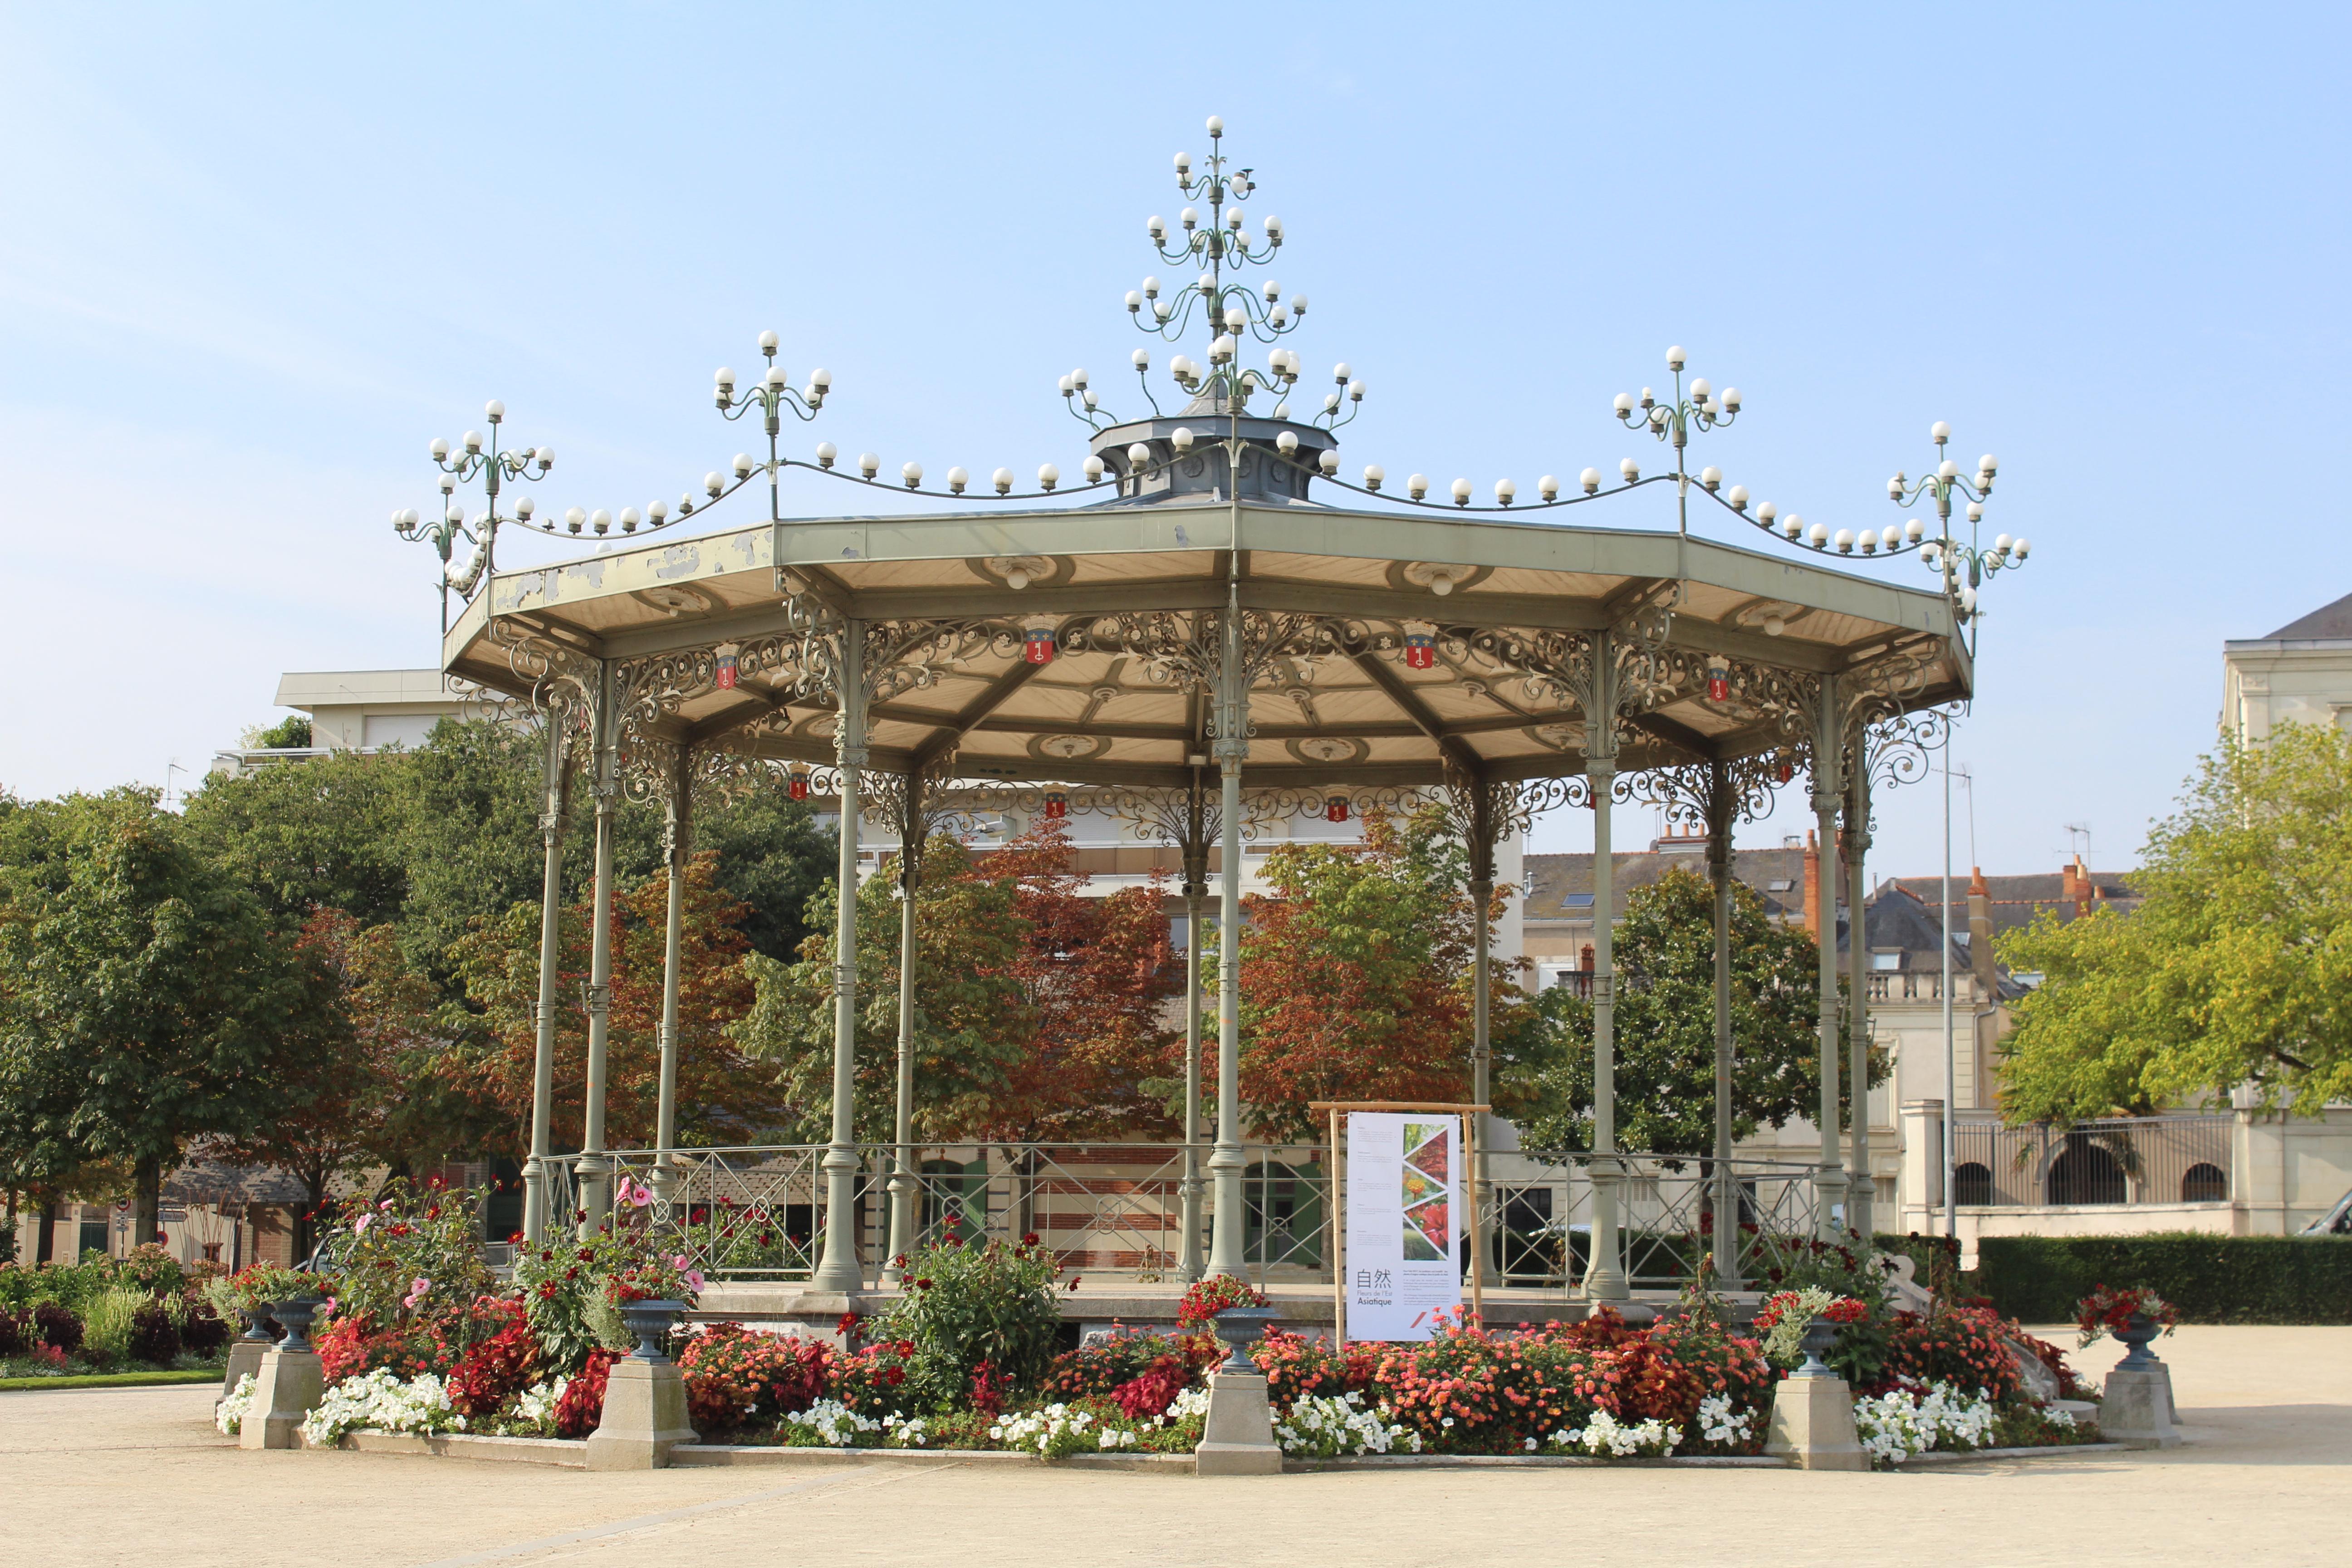 File:Kiosque Jardin Mail Angers 14.jpg - Wikimedia Commons